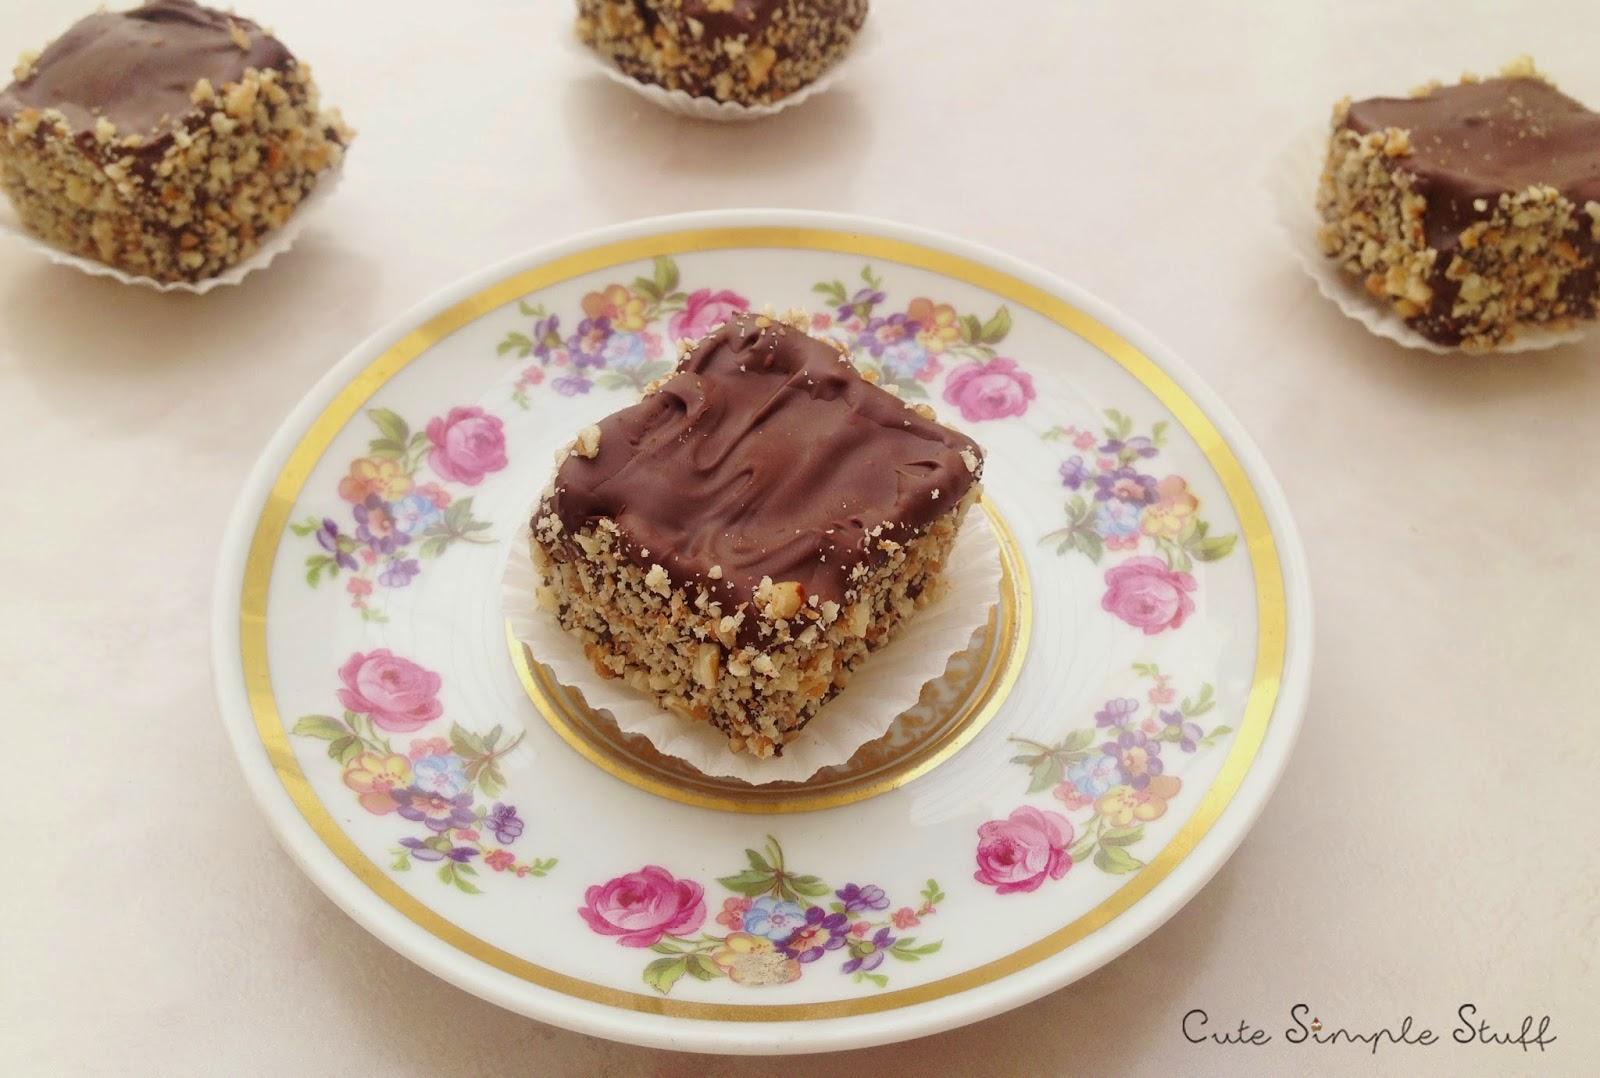 http://www.cutesimplestuff.com/2015/03/rise-cake-treats.html